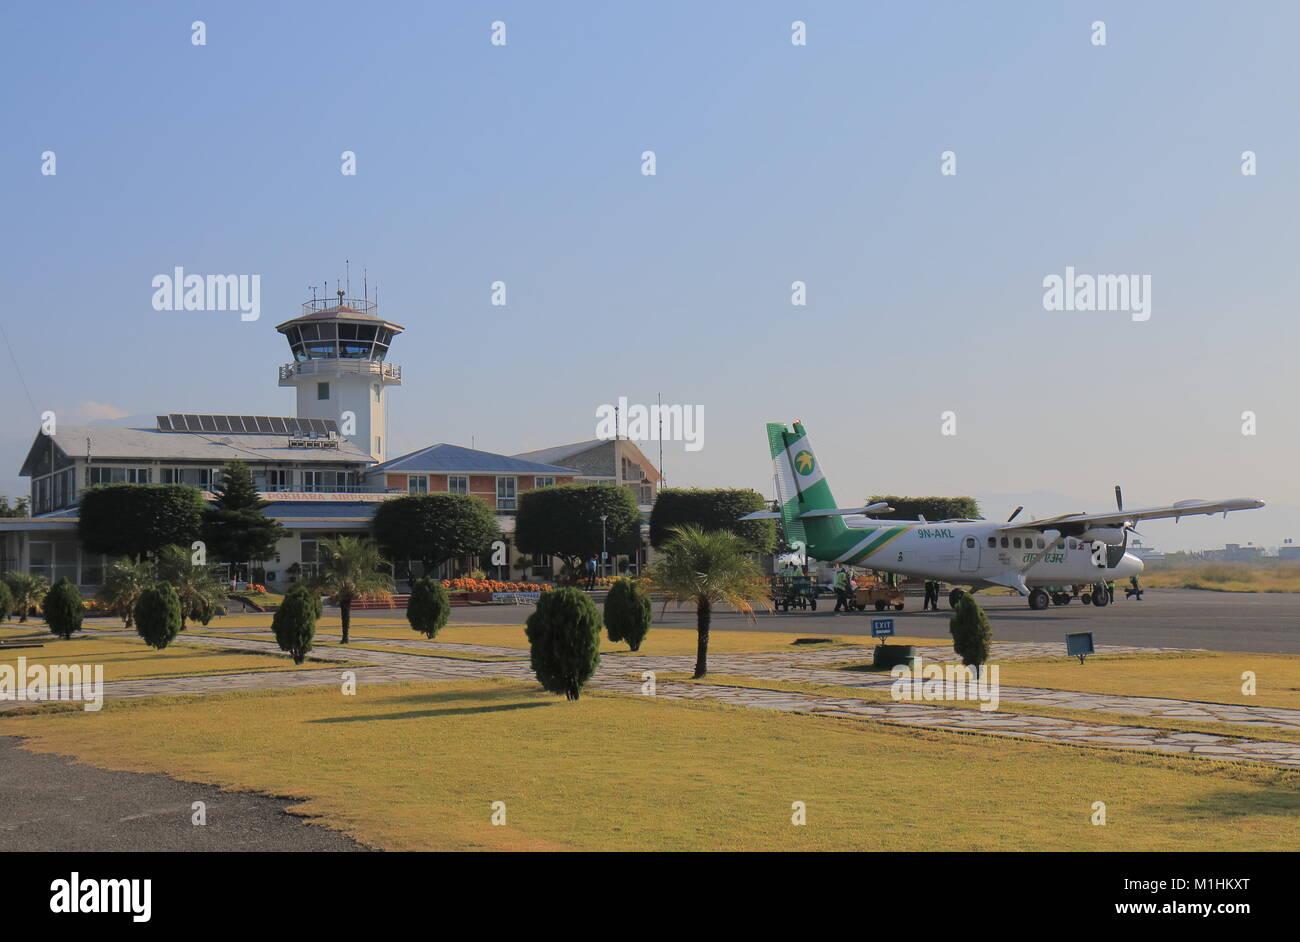 People take flight at Pokhara airport in Pokhara Nepal. - Stock Image